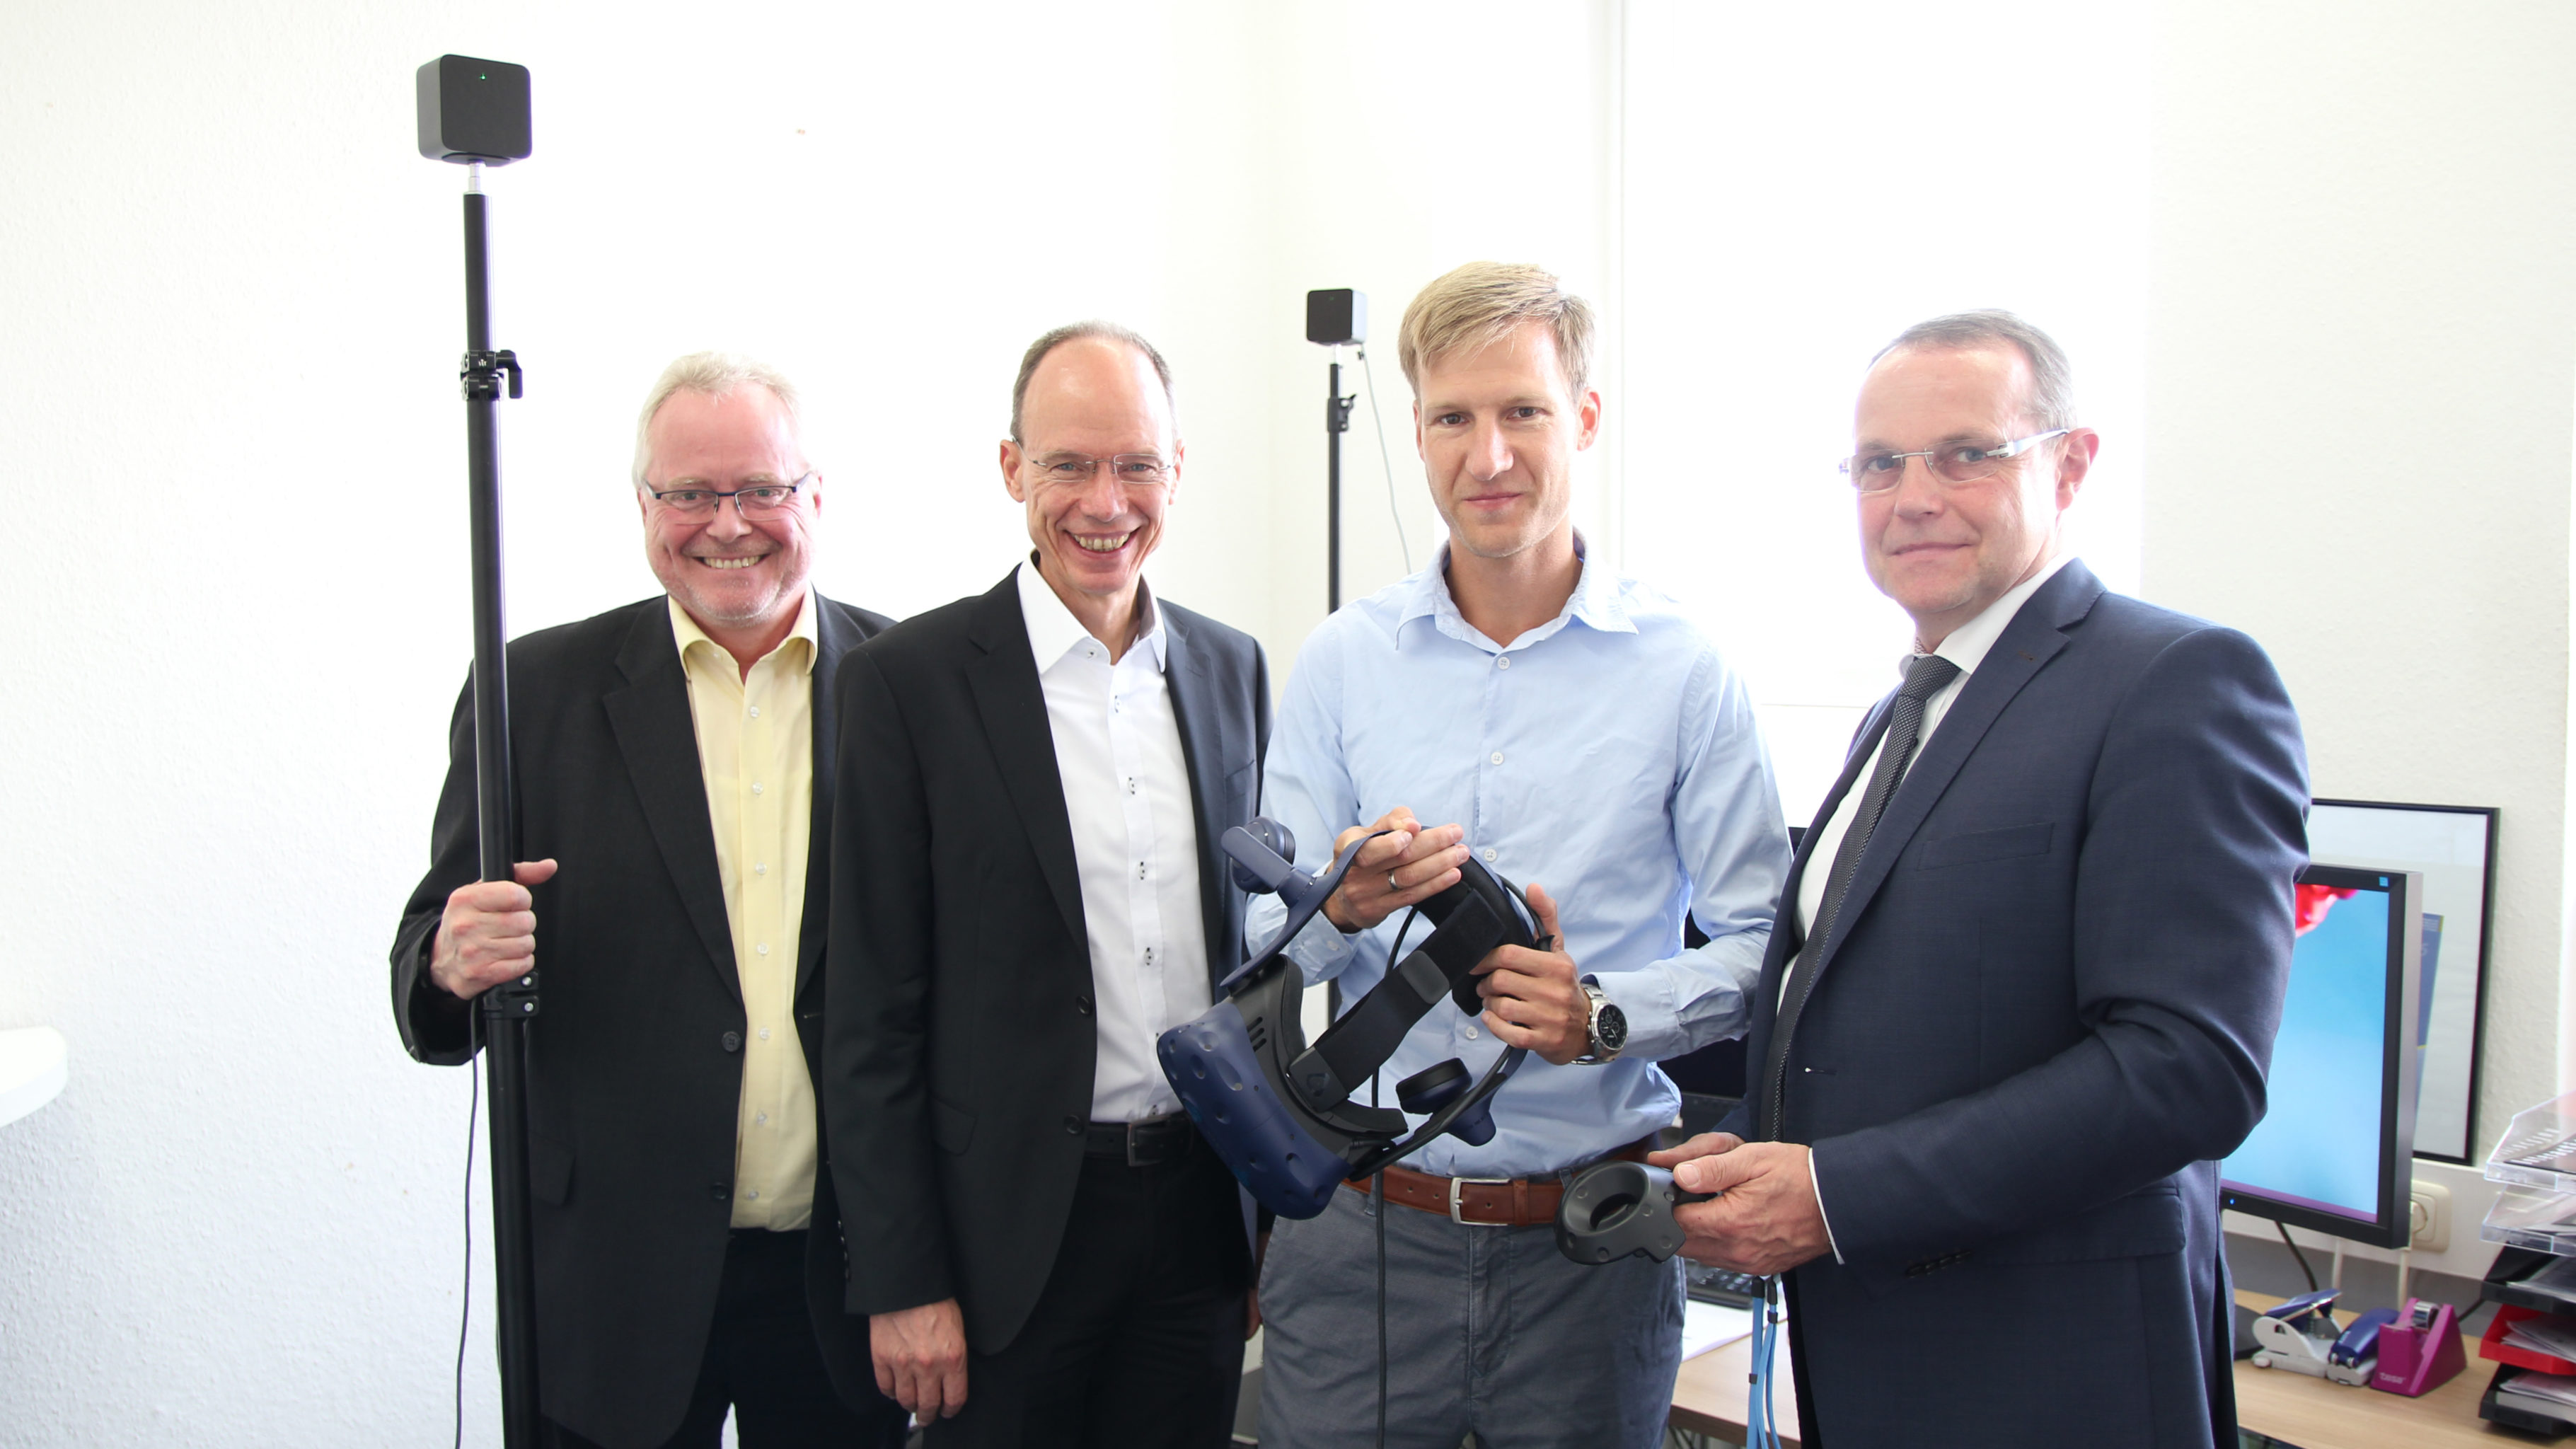 neue Technolgien in Niedersachsen